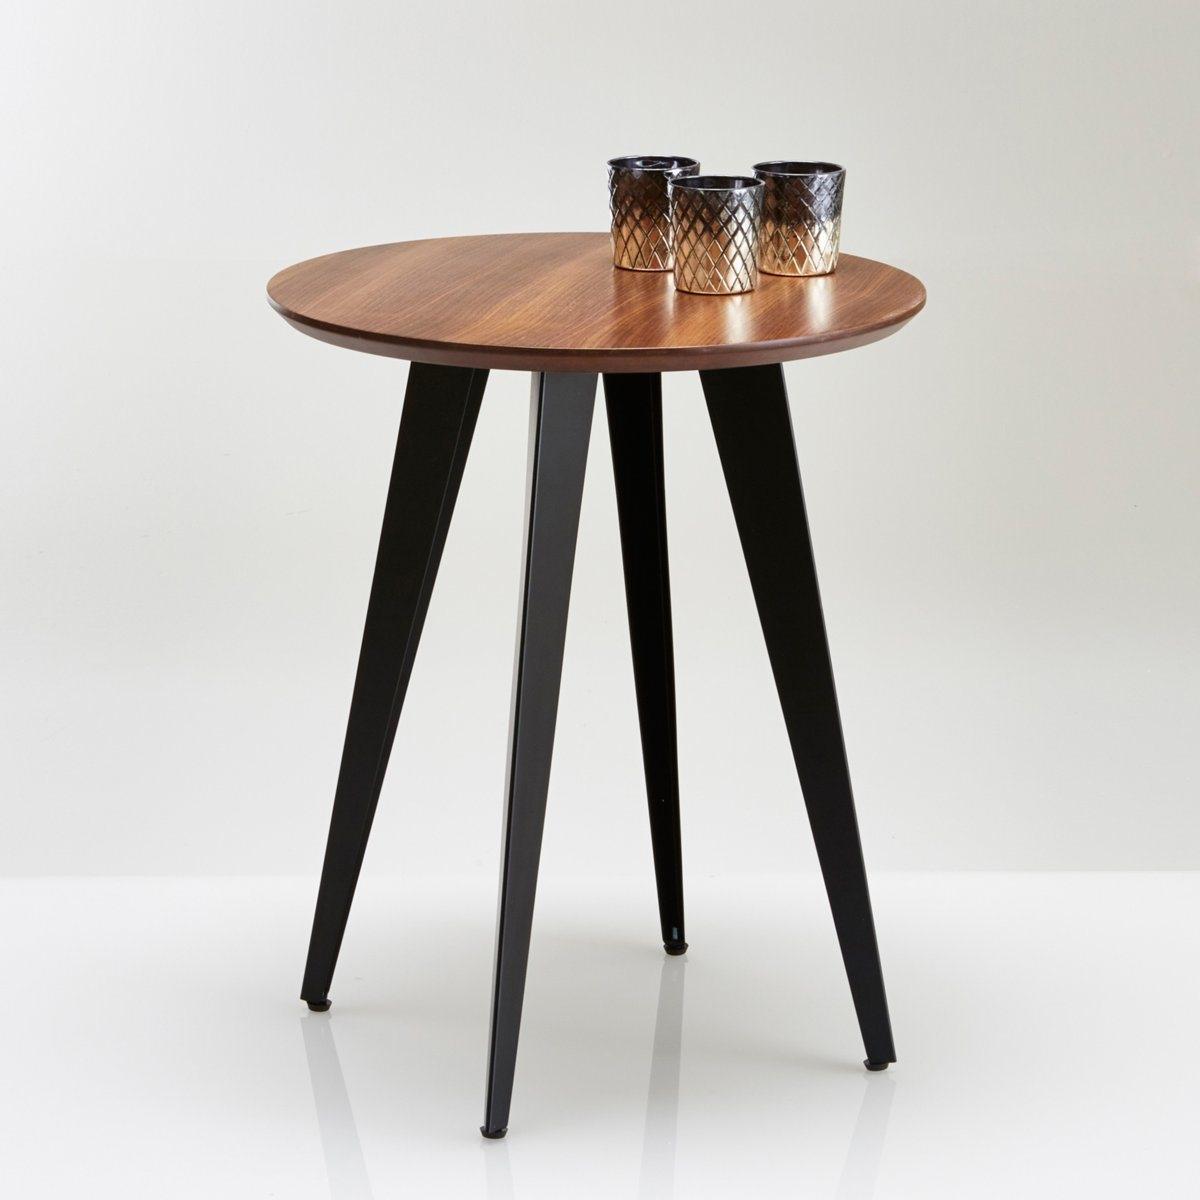 Круглый столик/столик для канапе в стиле винтаж   Watford